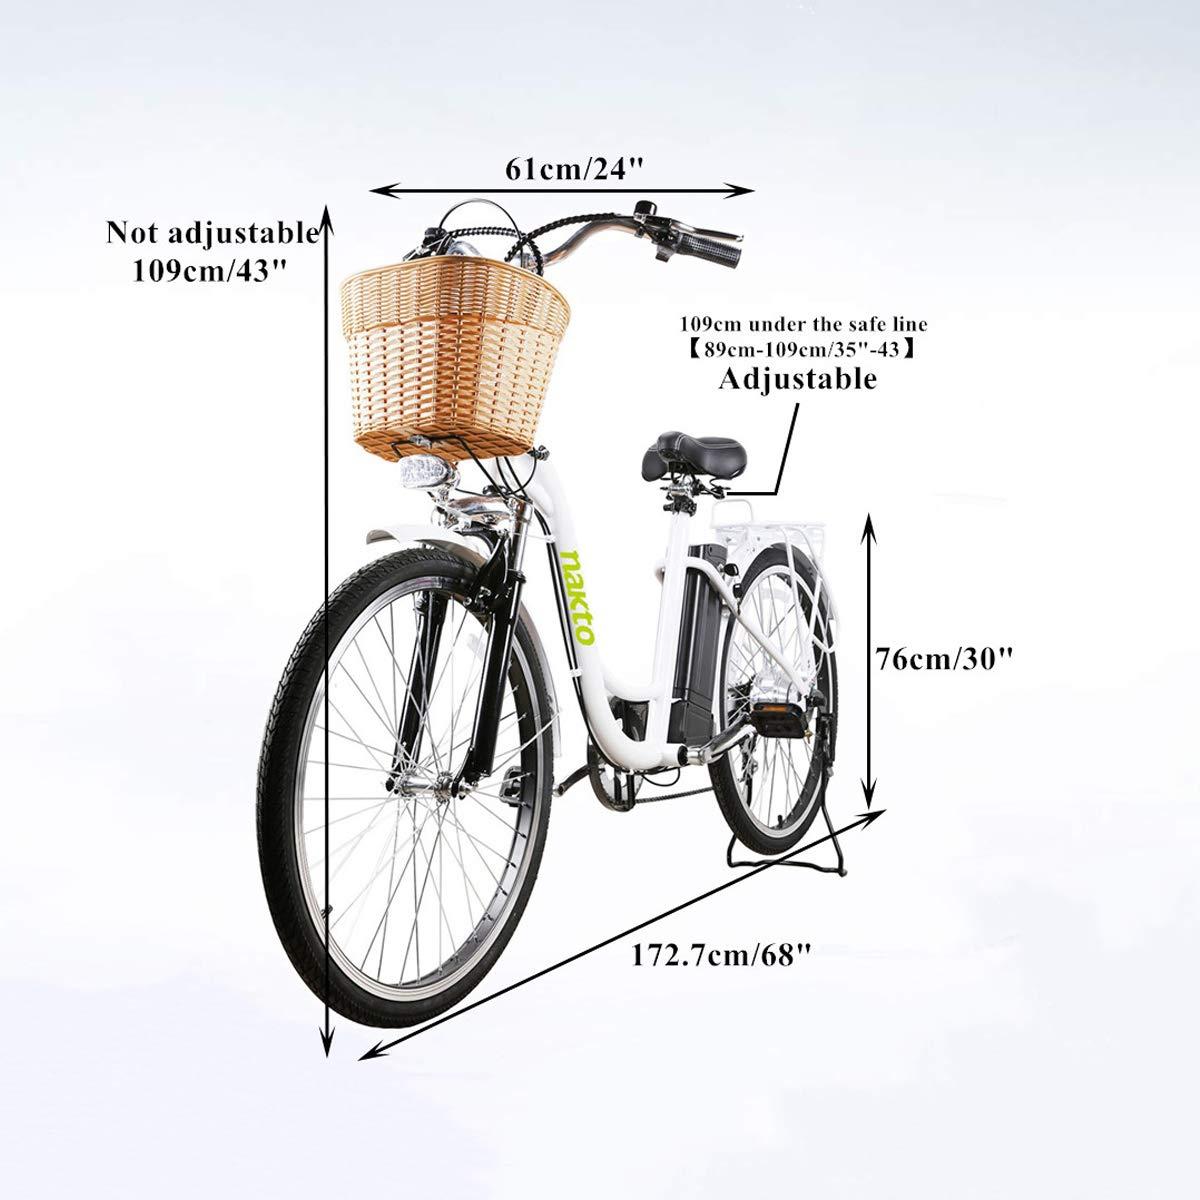 Amazon.com : NAKTO Adult Electric Bicycles 26